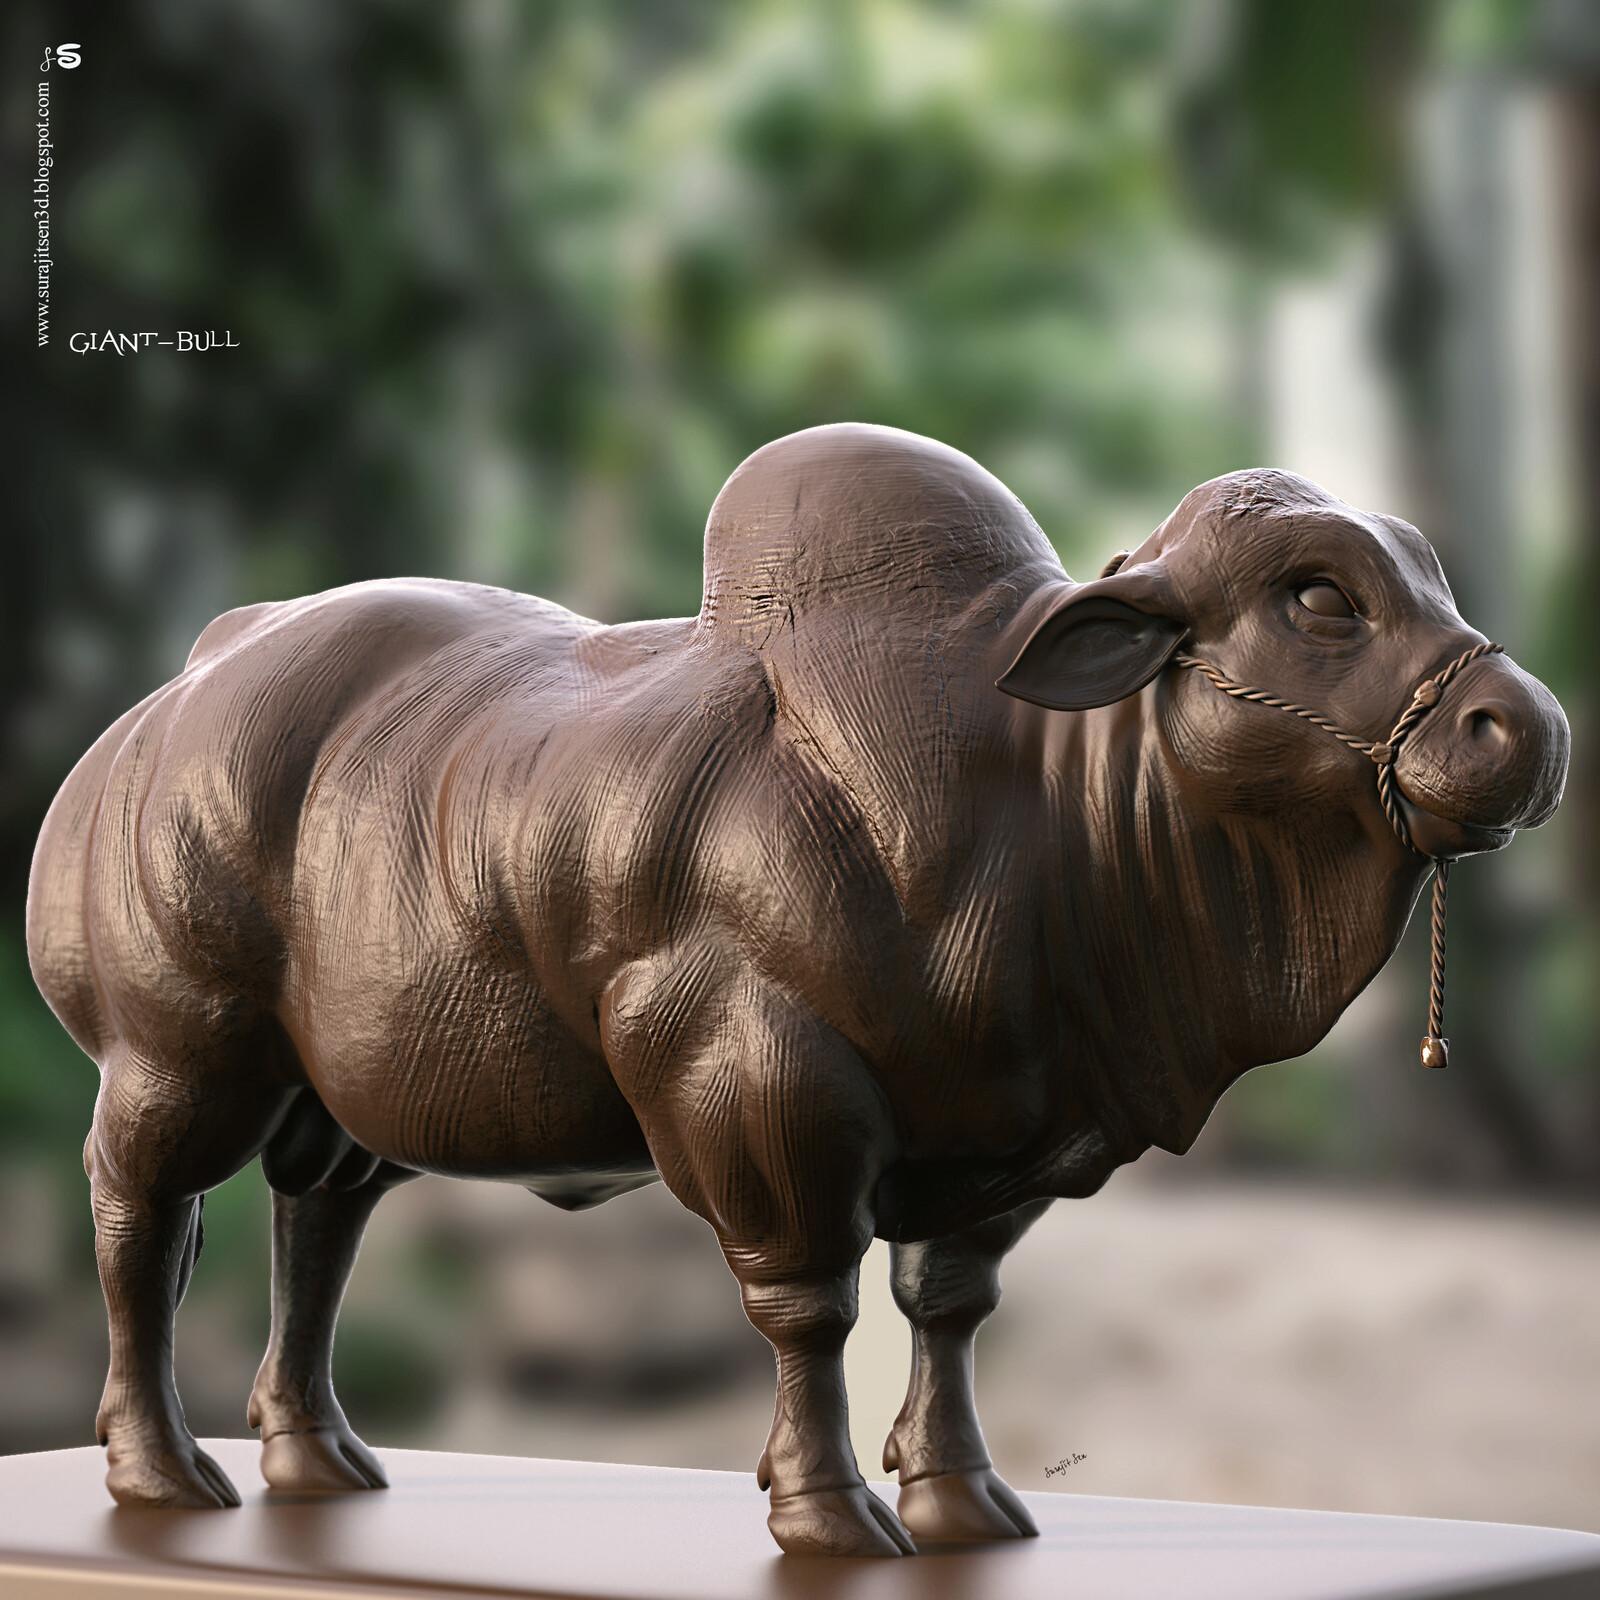 #todaystudy #todayssculpture Updated version one of my Digital Sculptures... Giant Bull Background music- #hanszimmermusic  #surajitsen #artist #indianartist #digitalsculpting #study #bull #bullsculpture